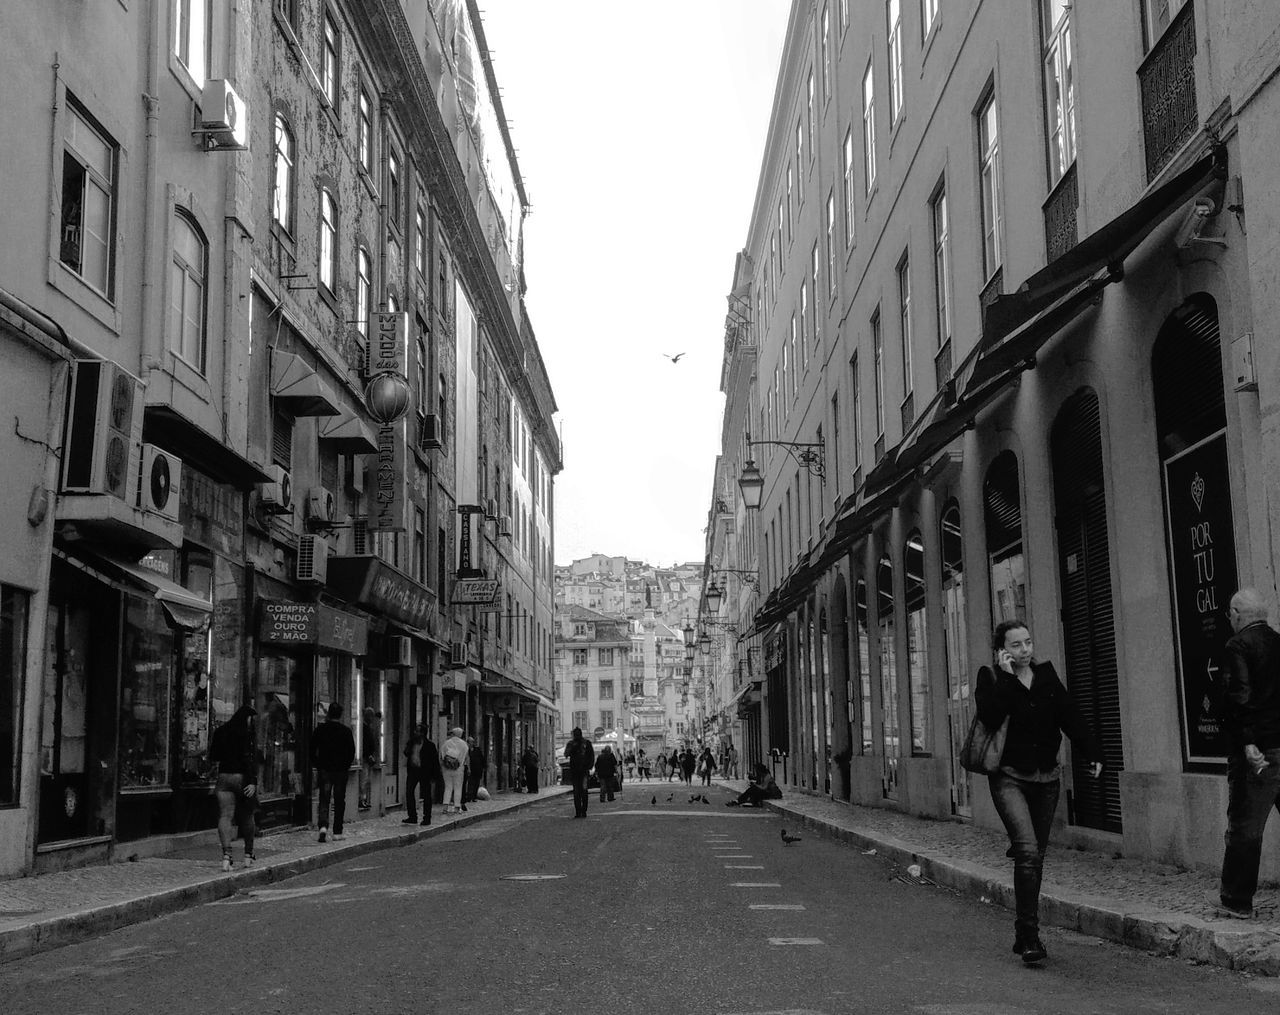 Lisboa ao Fundo Street Photography Bw_collection Avenue